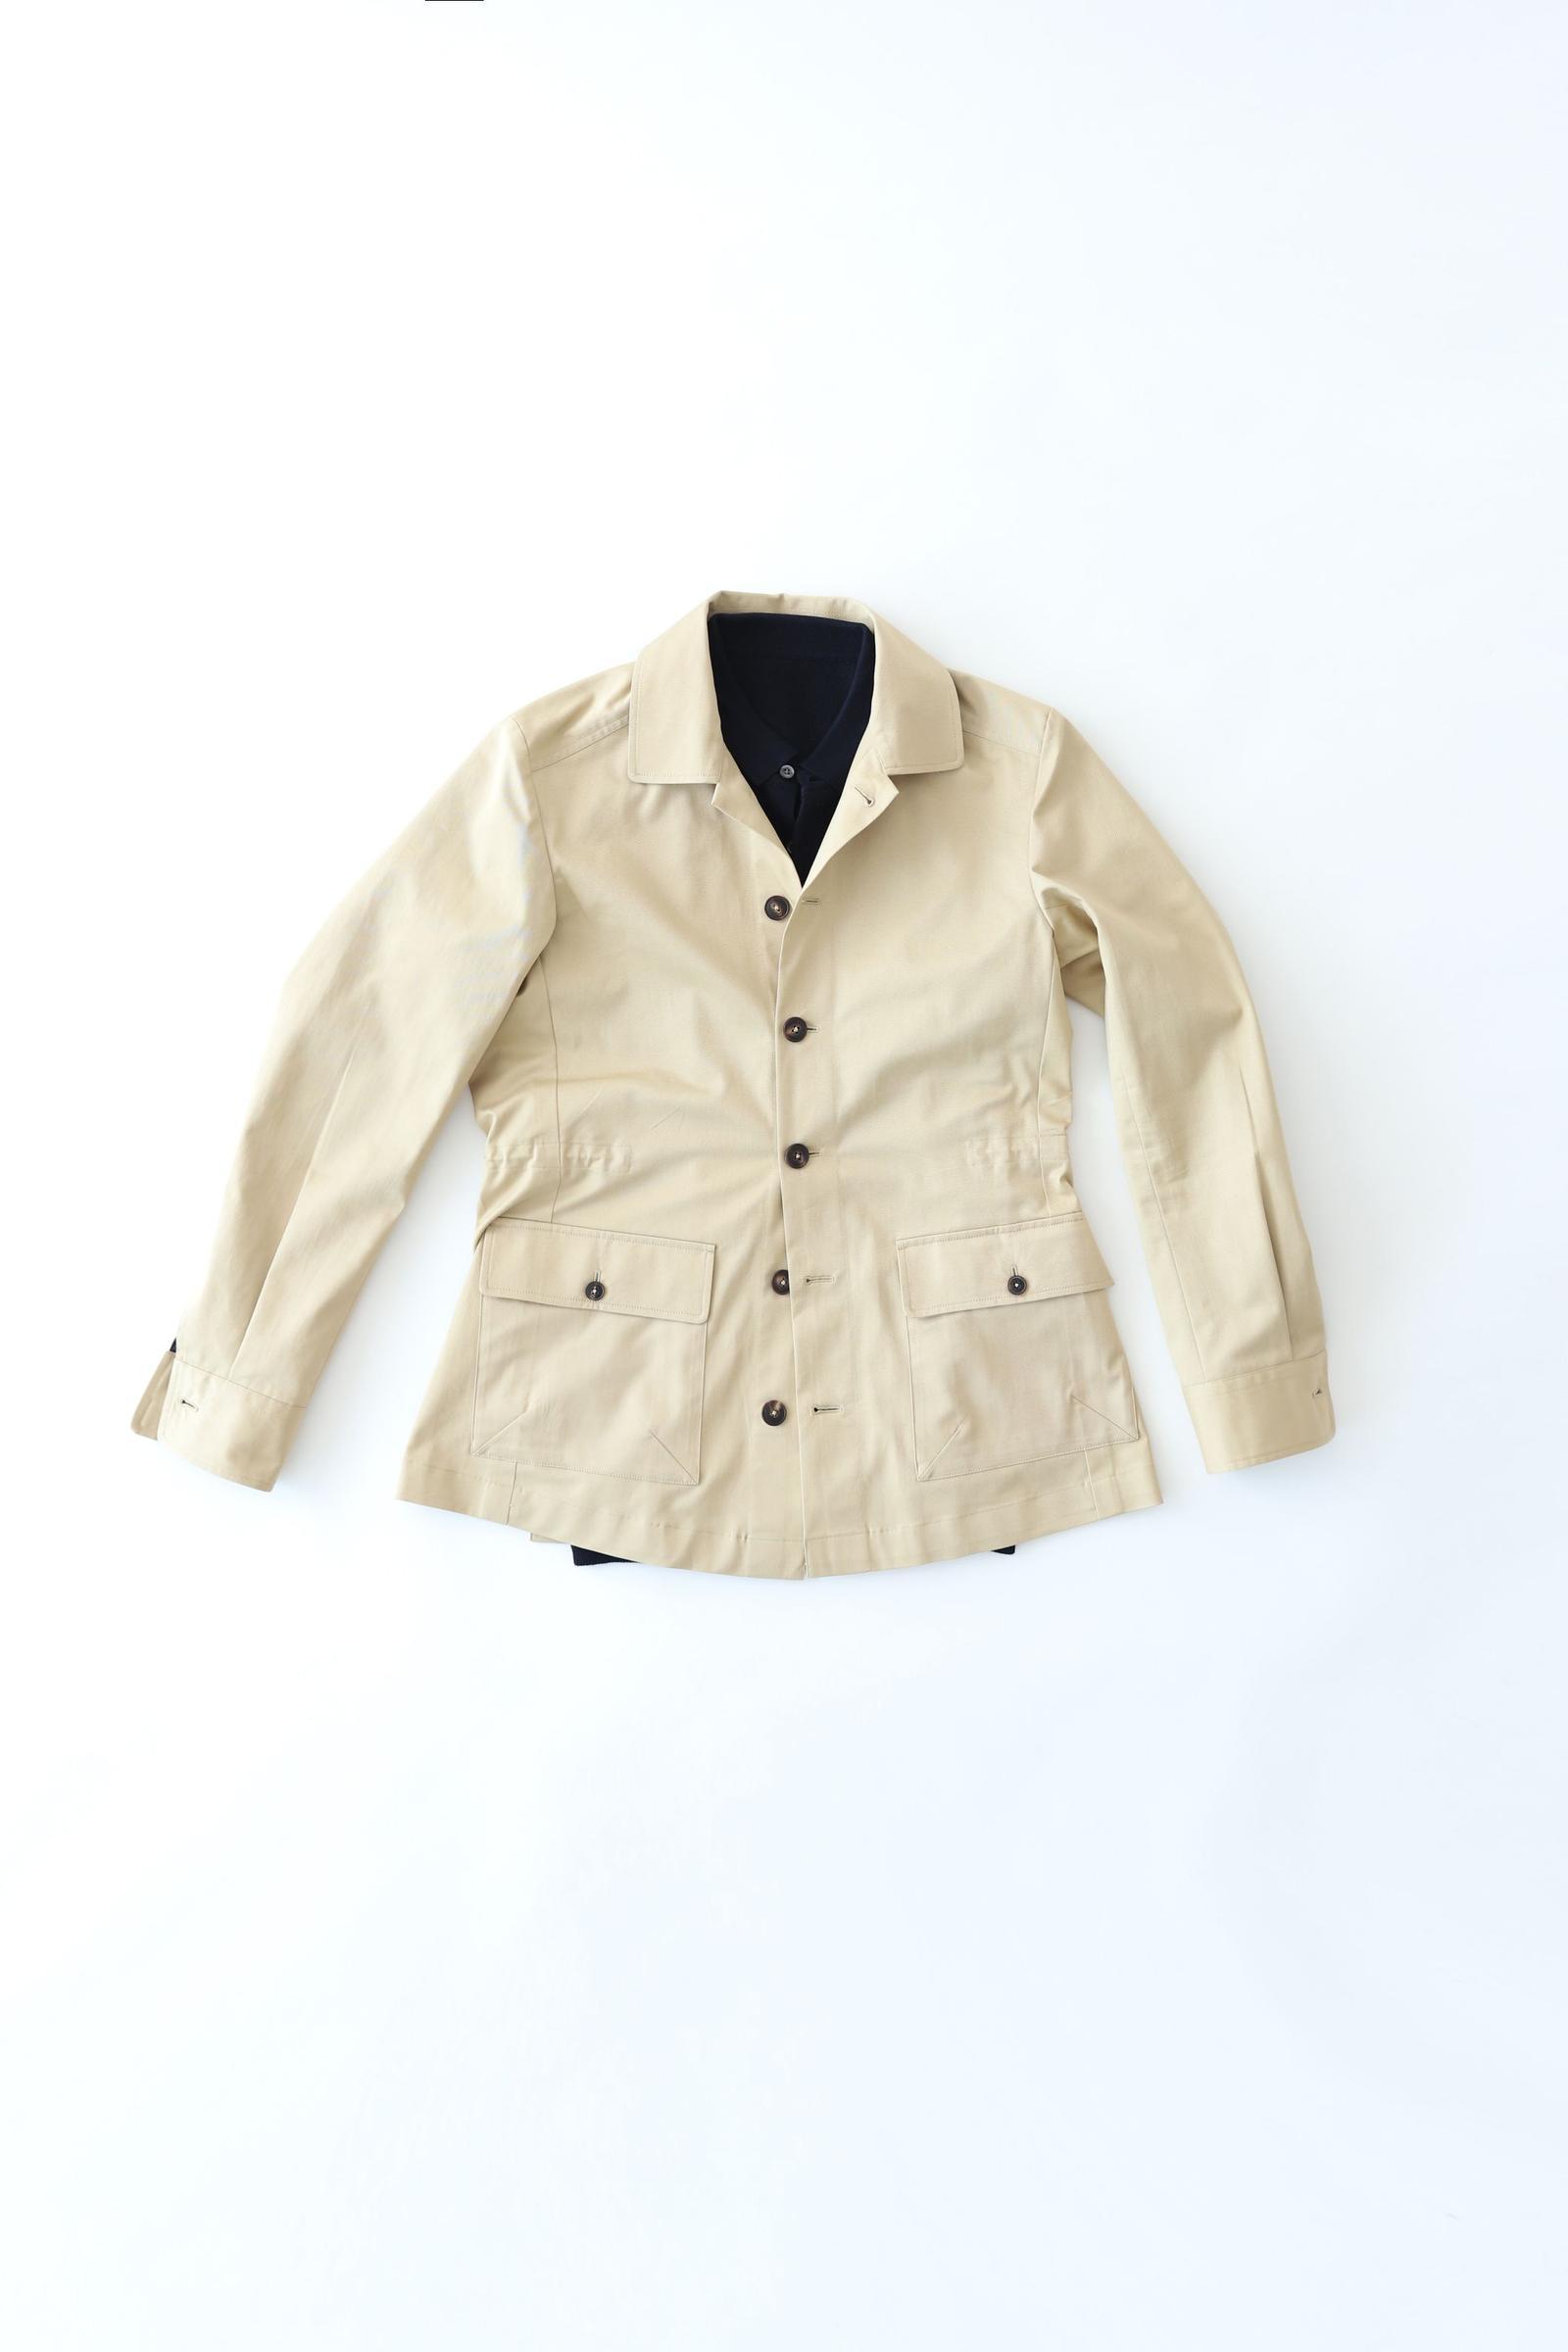 City Safari Jacket - Beige Cotton